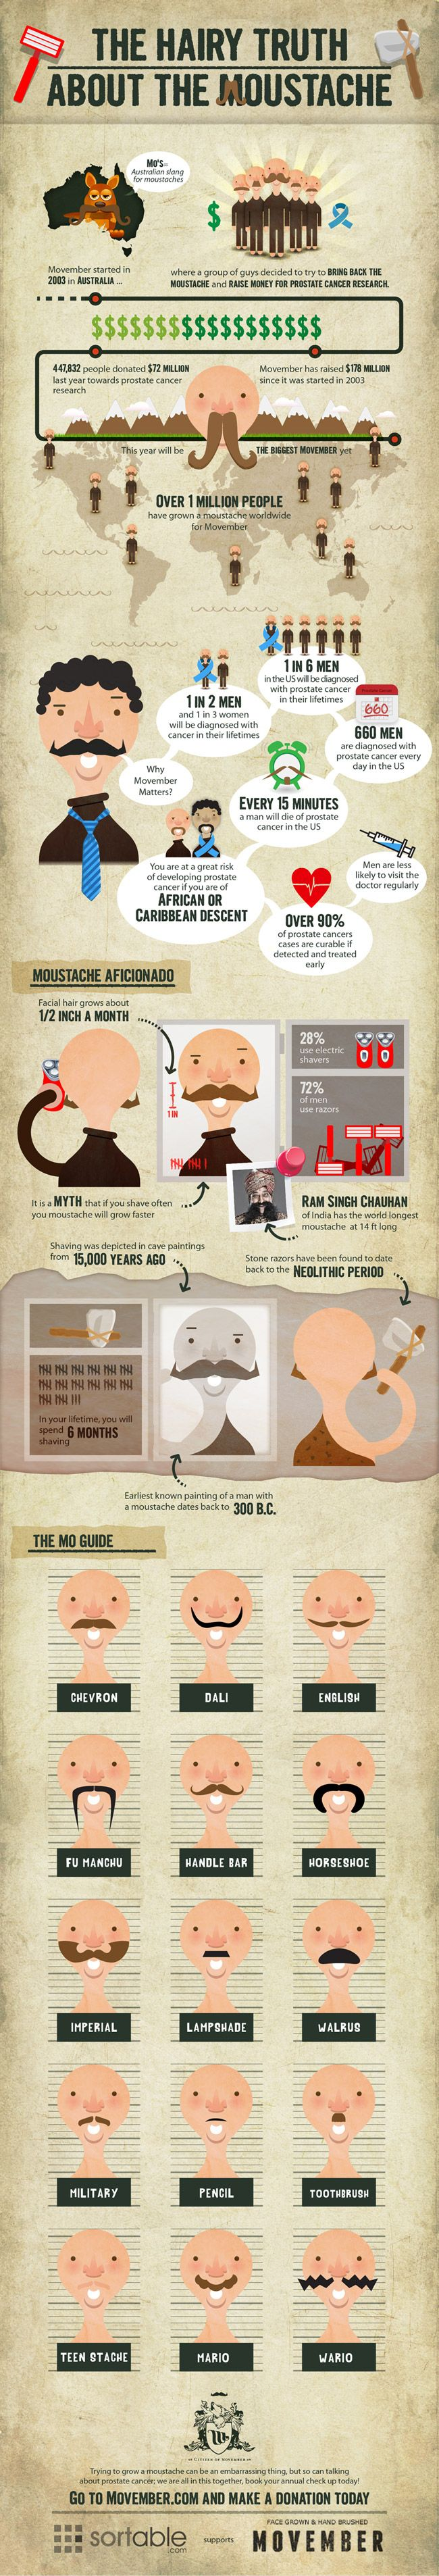 Mustache infographic? Mustache infographic.